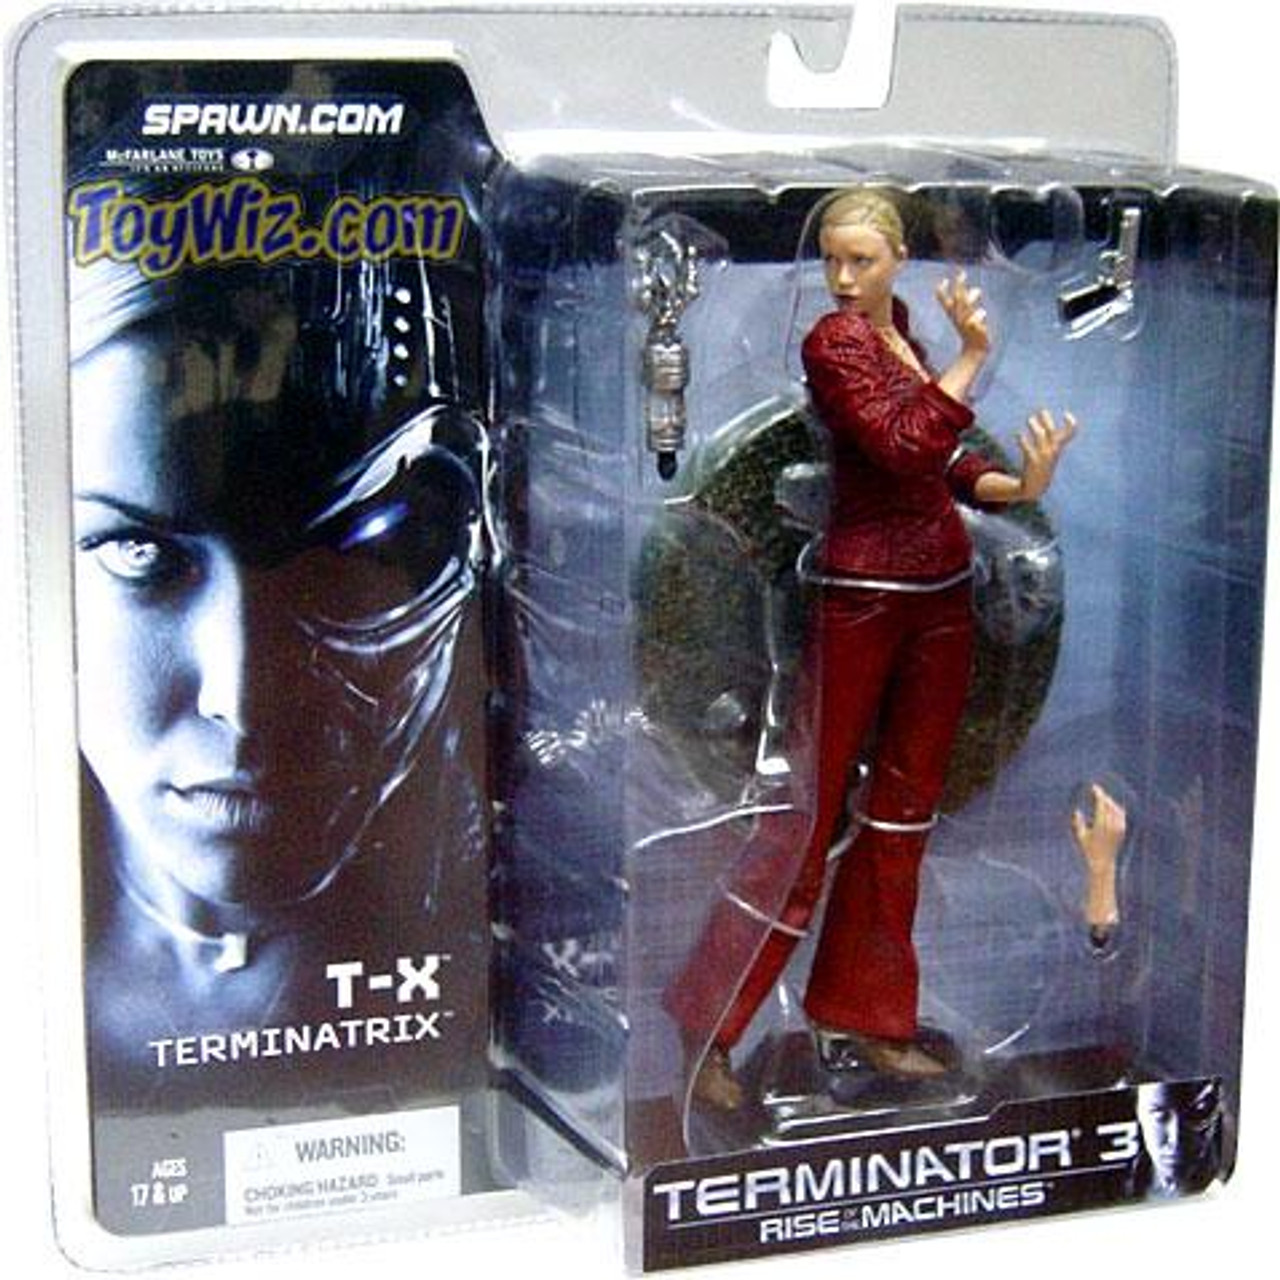 McFarlane Toys Terminator Rise of the Machines T-X Terminatrix Action Figure